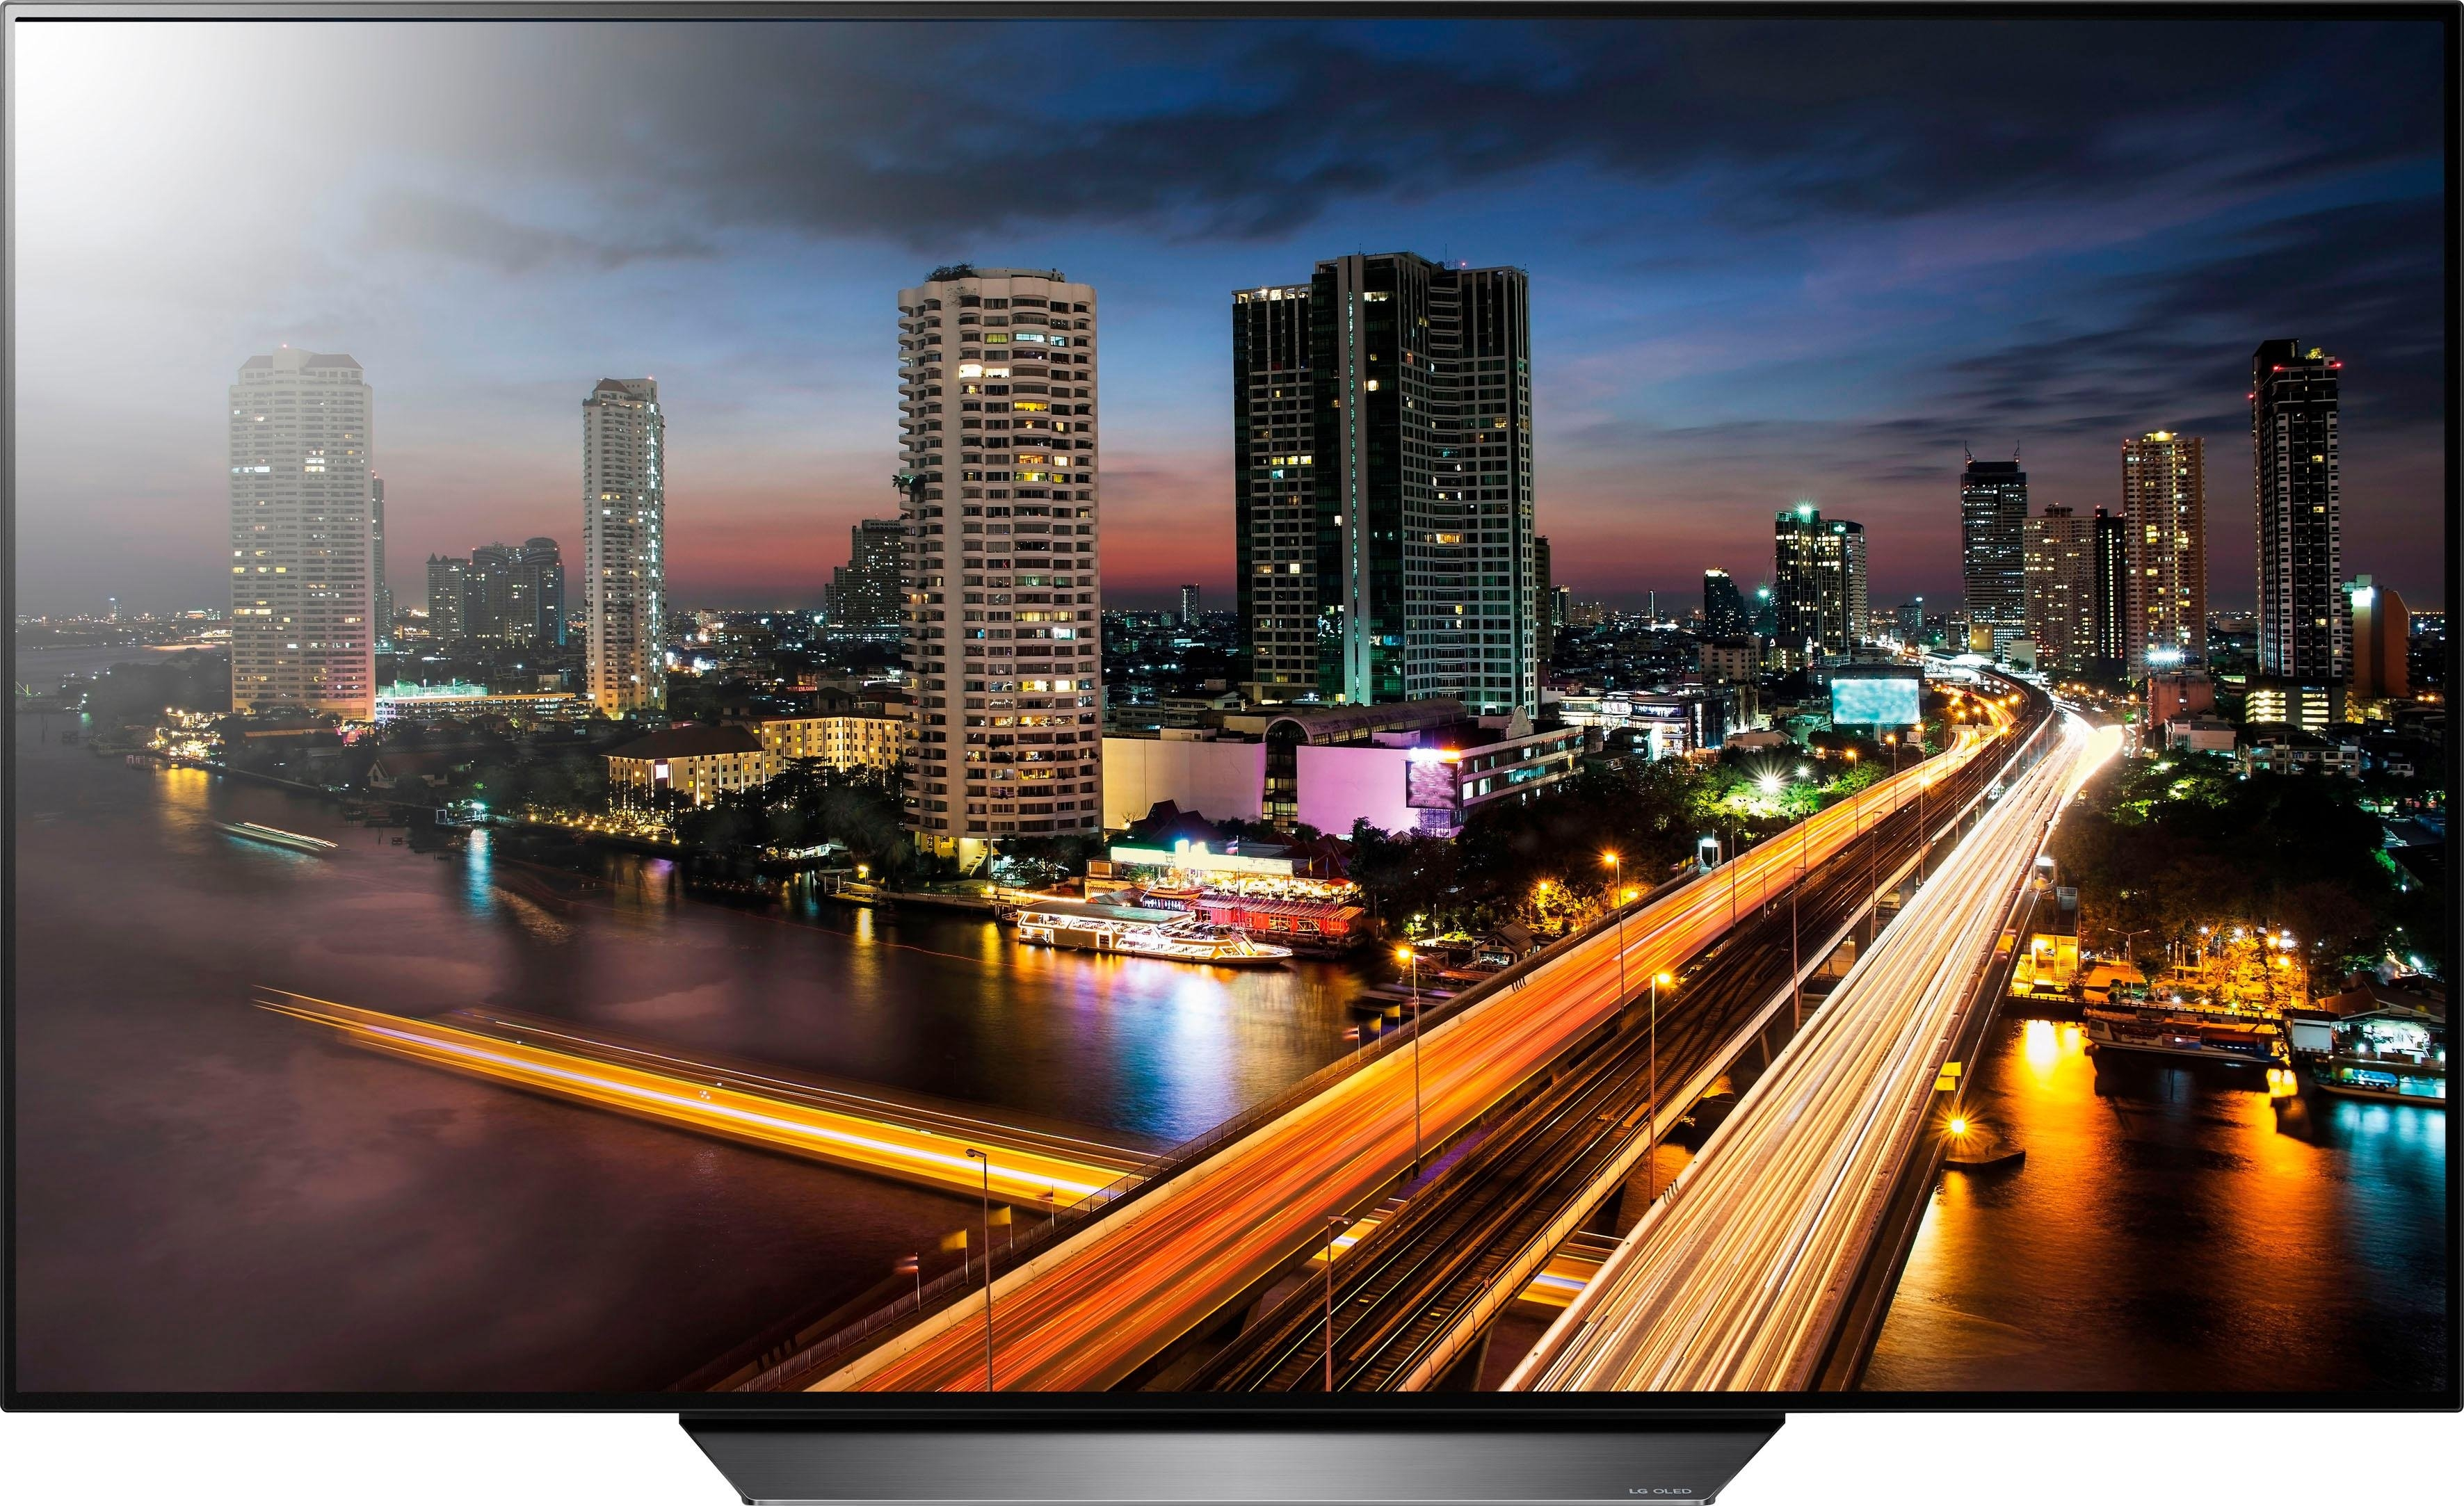 LG OLED55B8LLA oled-tv (55 inch), 4K Ultra HD, smart-tv - gratis ruilen op otto.nl